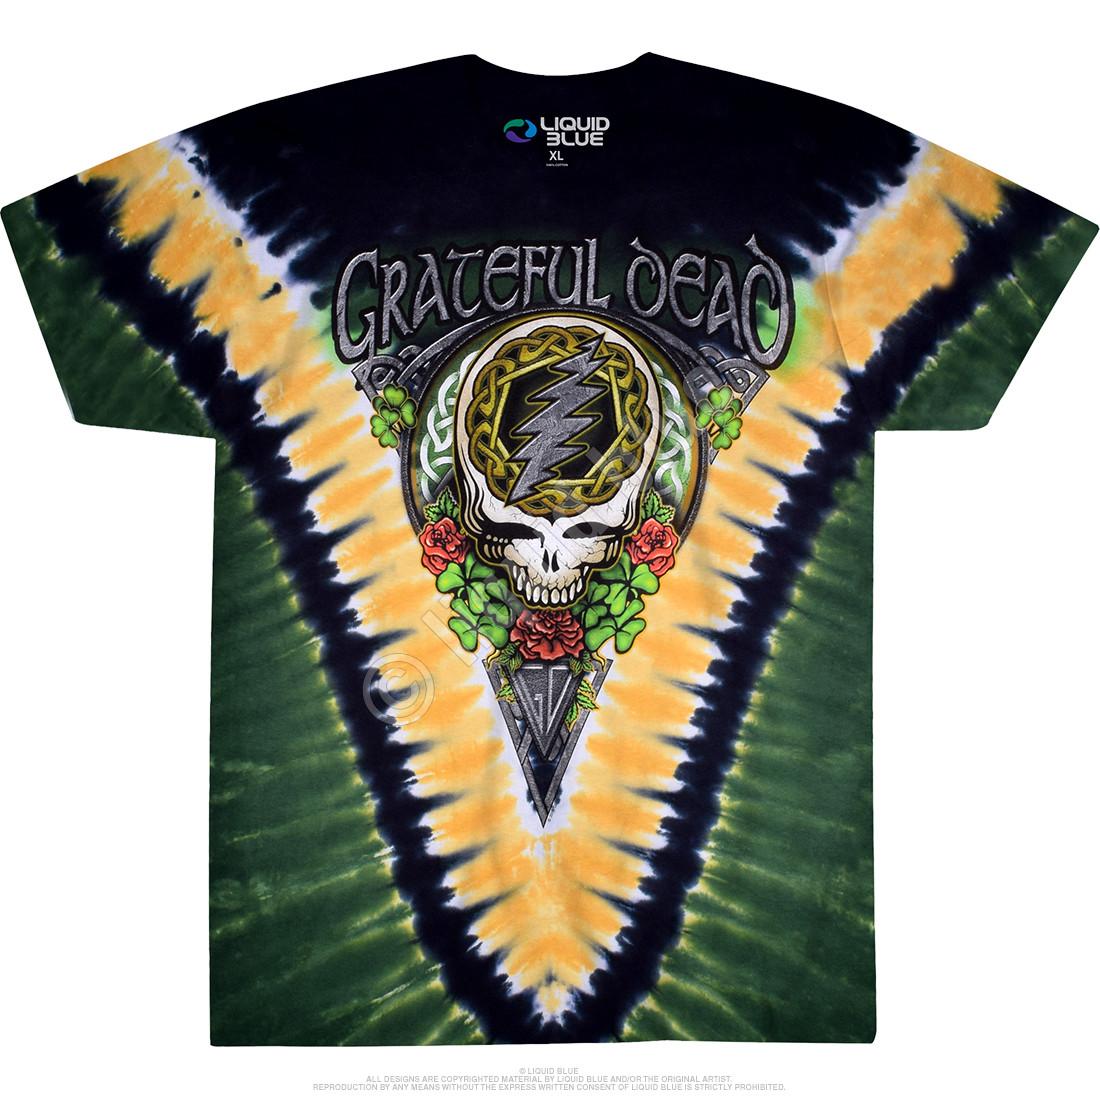 3XL 5XL 2XL 6XL TieDye TShirt LB XL Grateful Dead Space Your Face M L 4XL